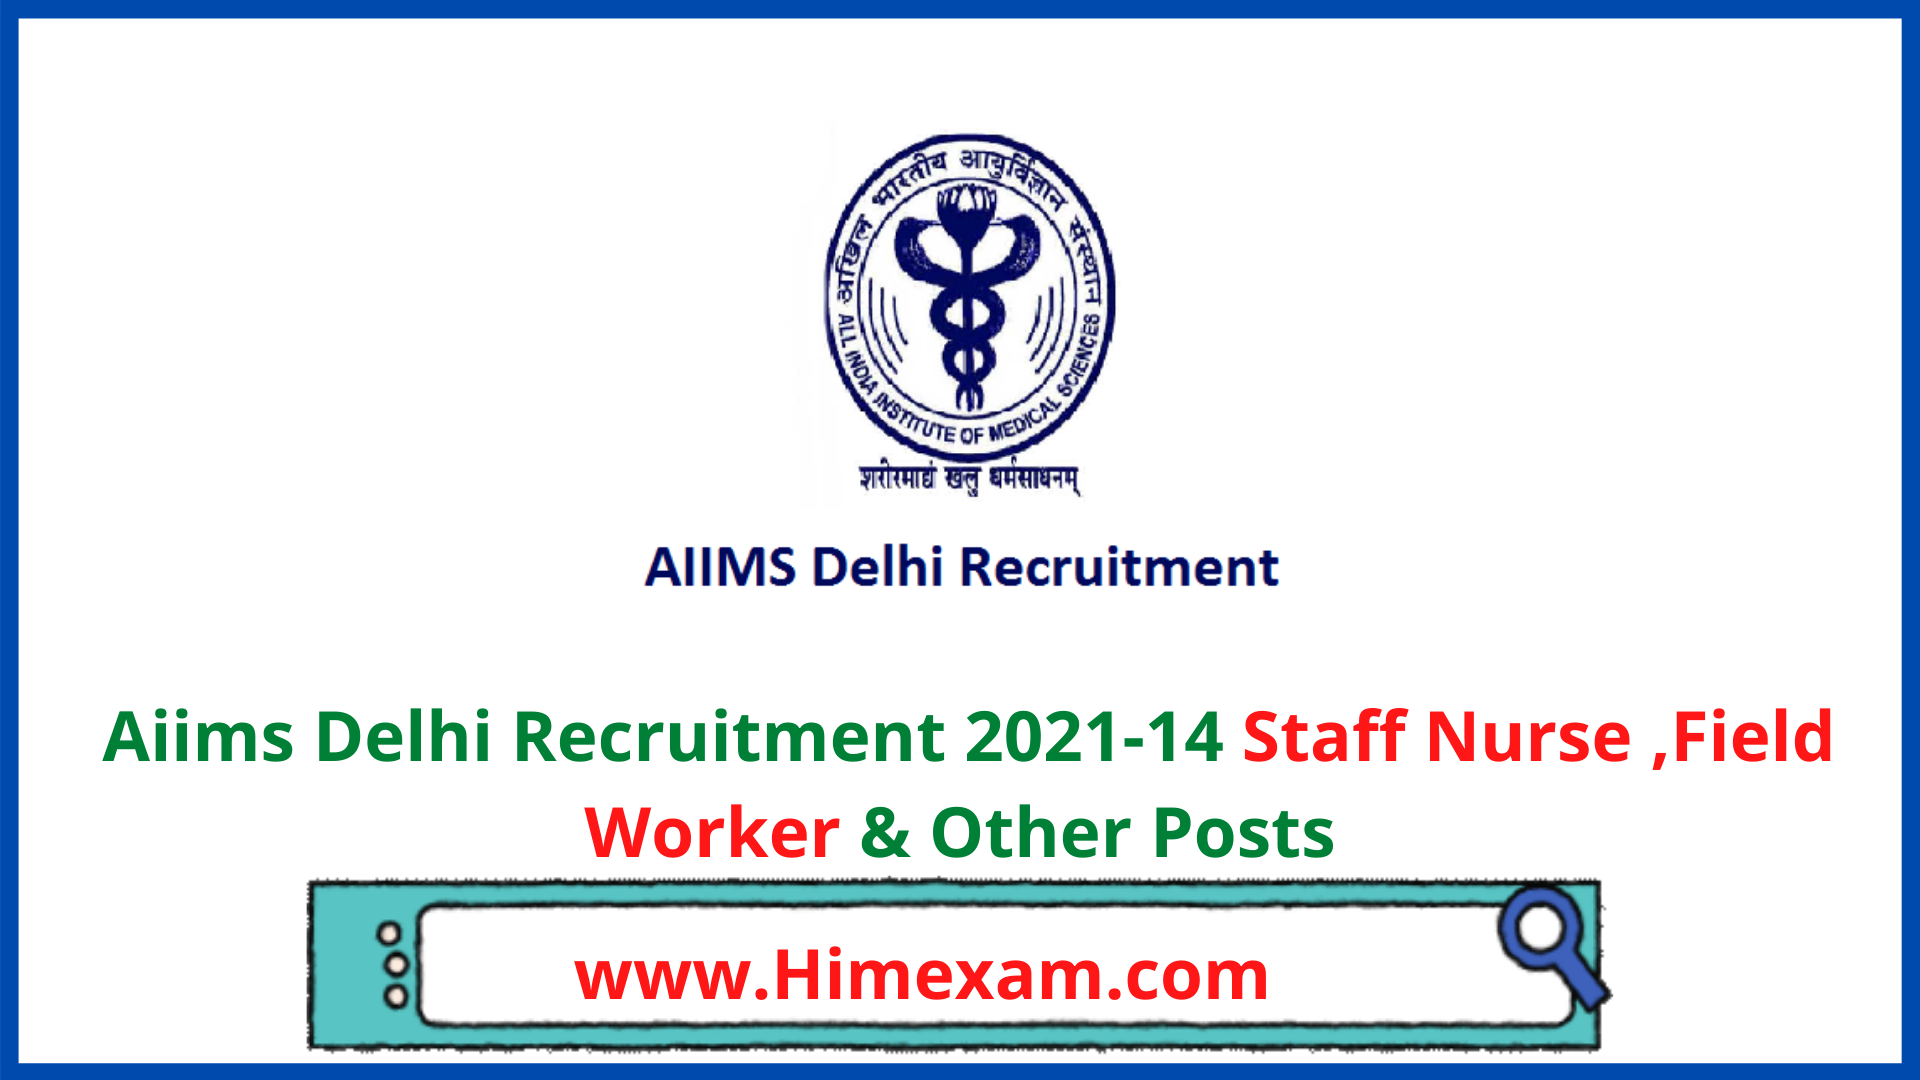 Aiims Delhi Recruitment 2021-14 Staff Nurse ,Field Worker & Other Posts